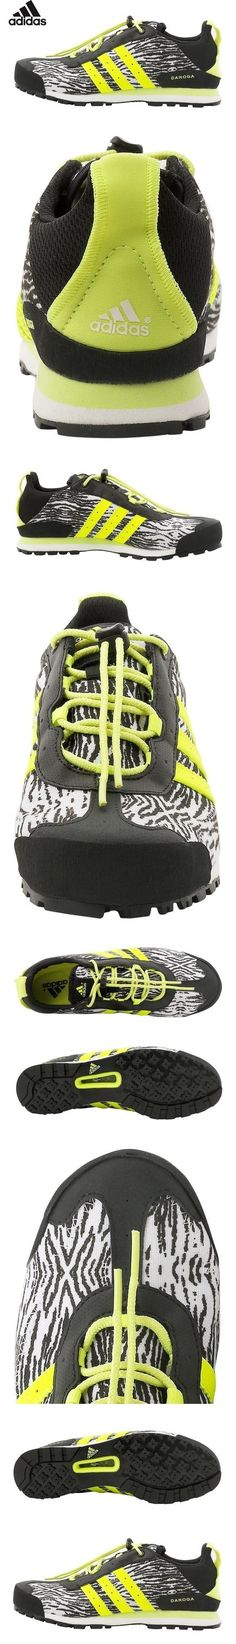 official photos 14c47 d8525  74.99 - adidas Women s CC Daroga Sneaker,Black White Electric,8.5 M